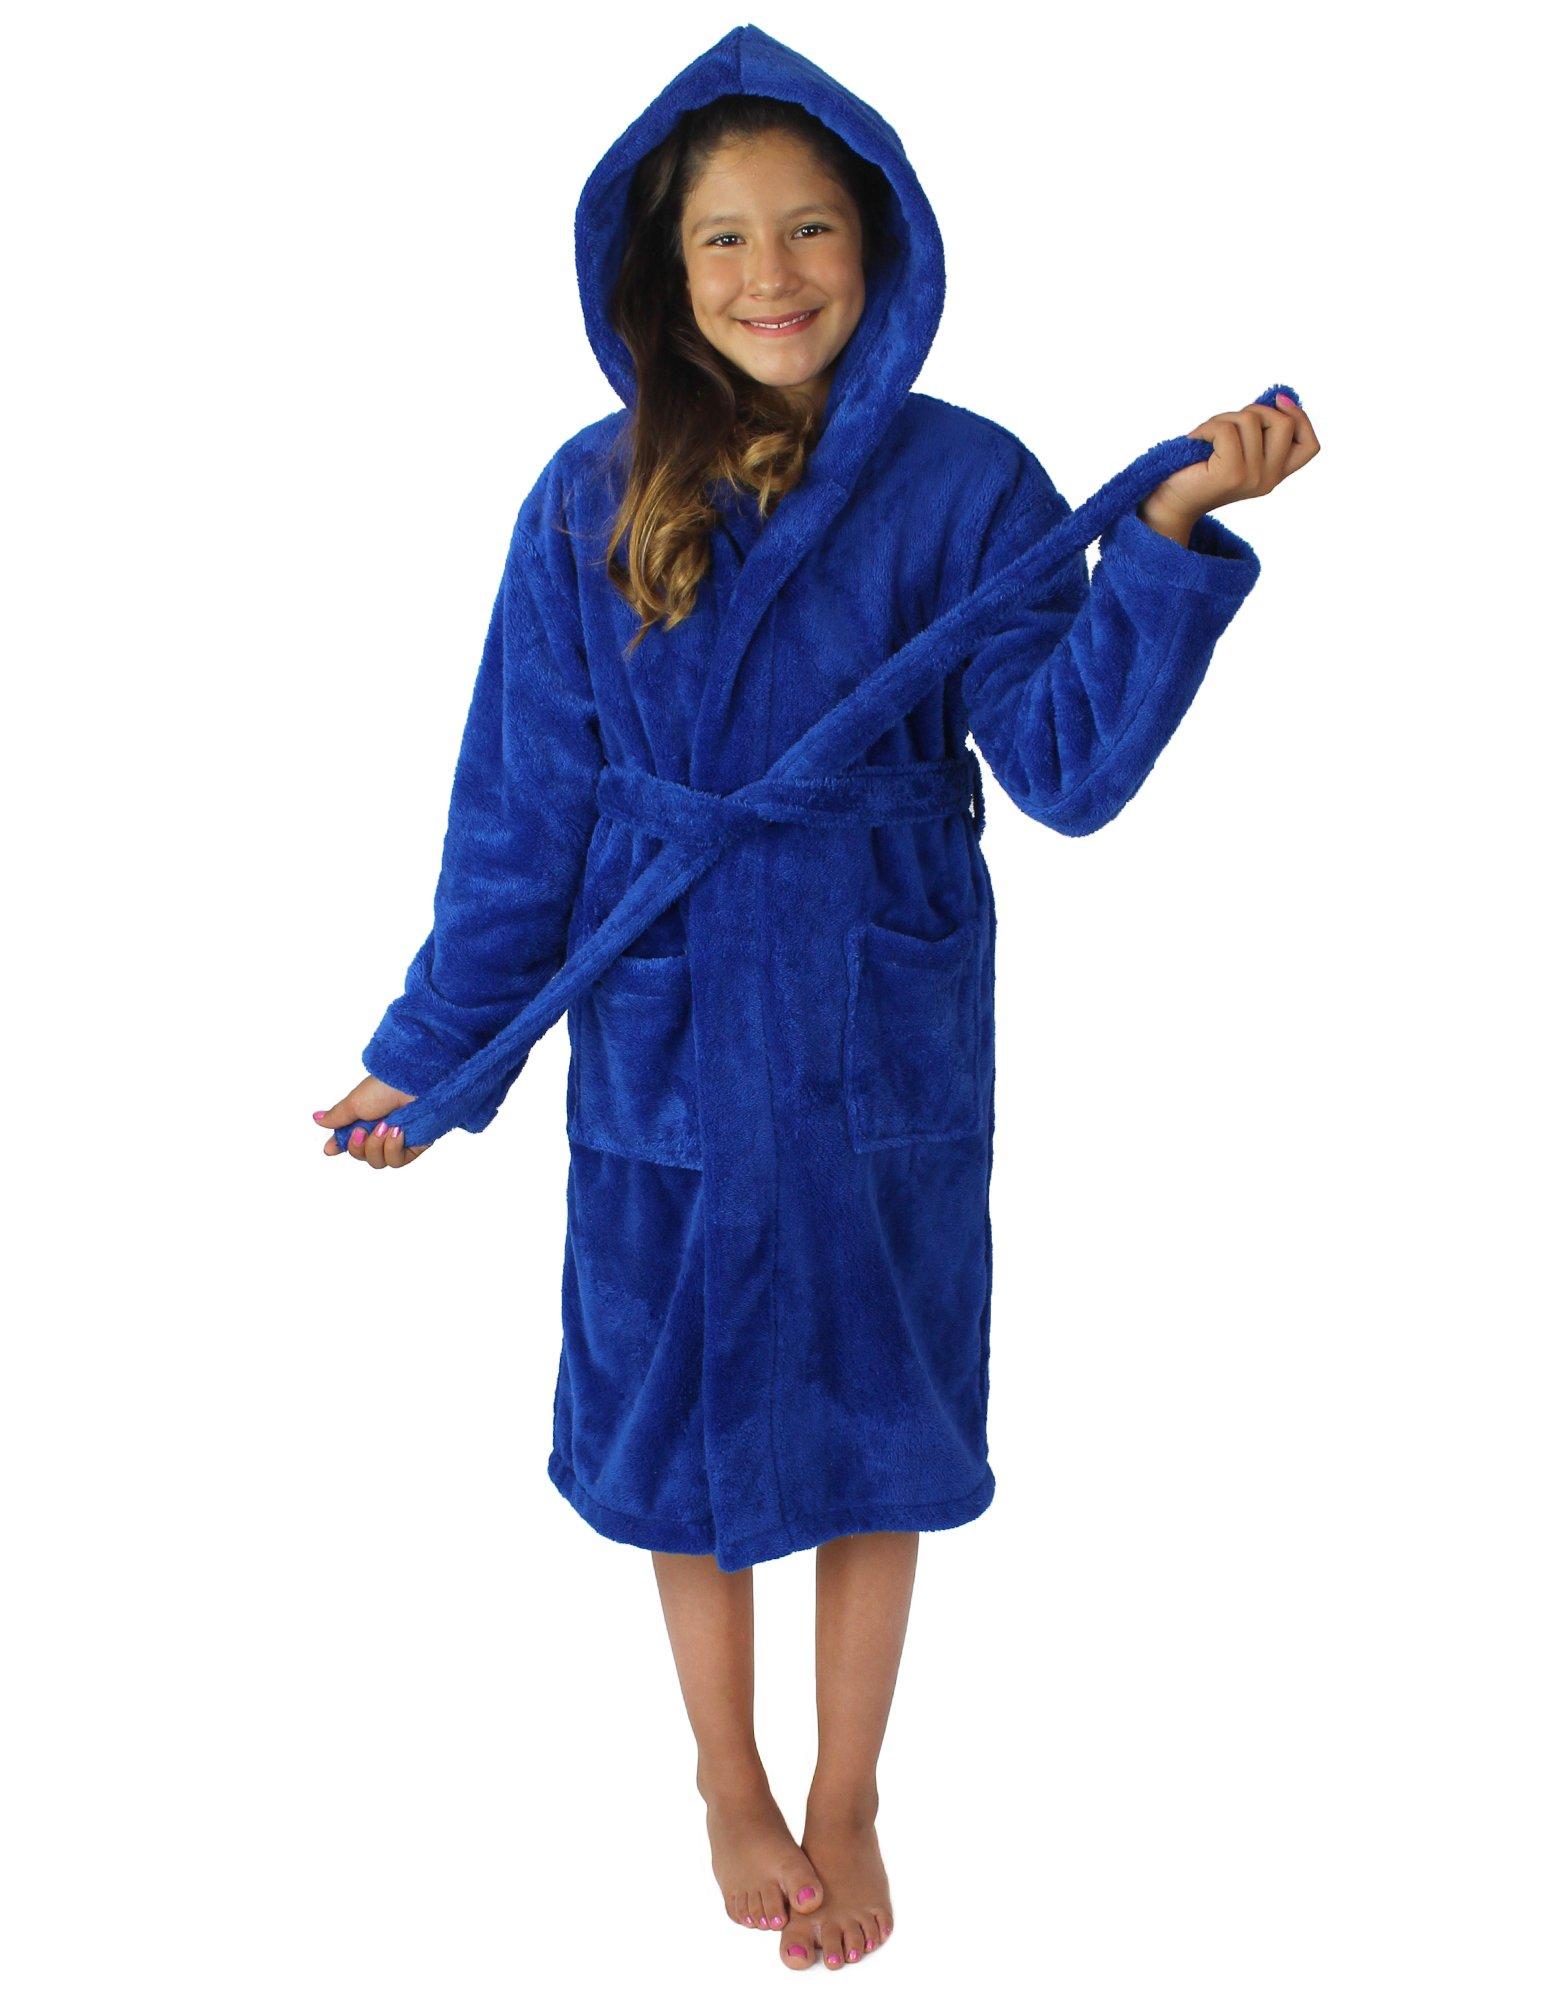 Kids Plush and Soft Fleece Hooded Bathrobe for Girls and Boys (Royal Blue, Medium)